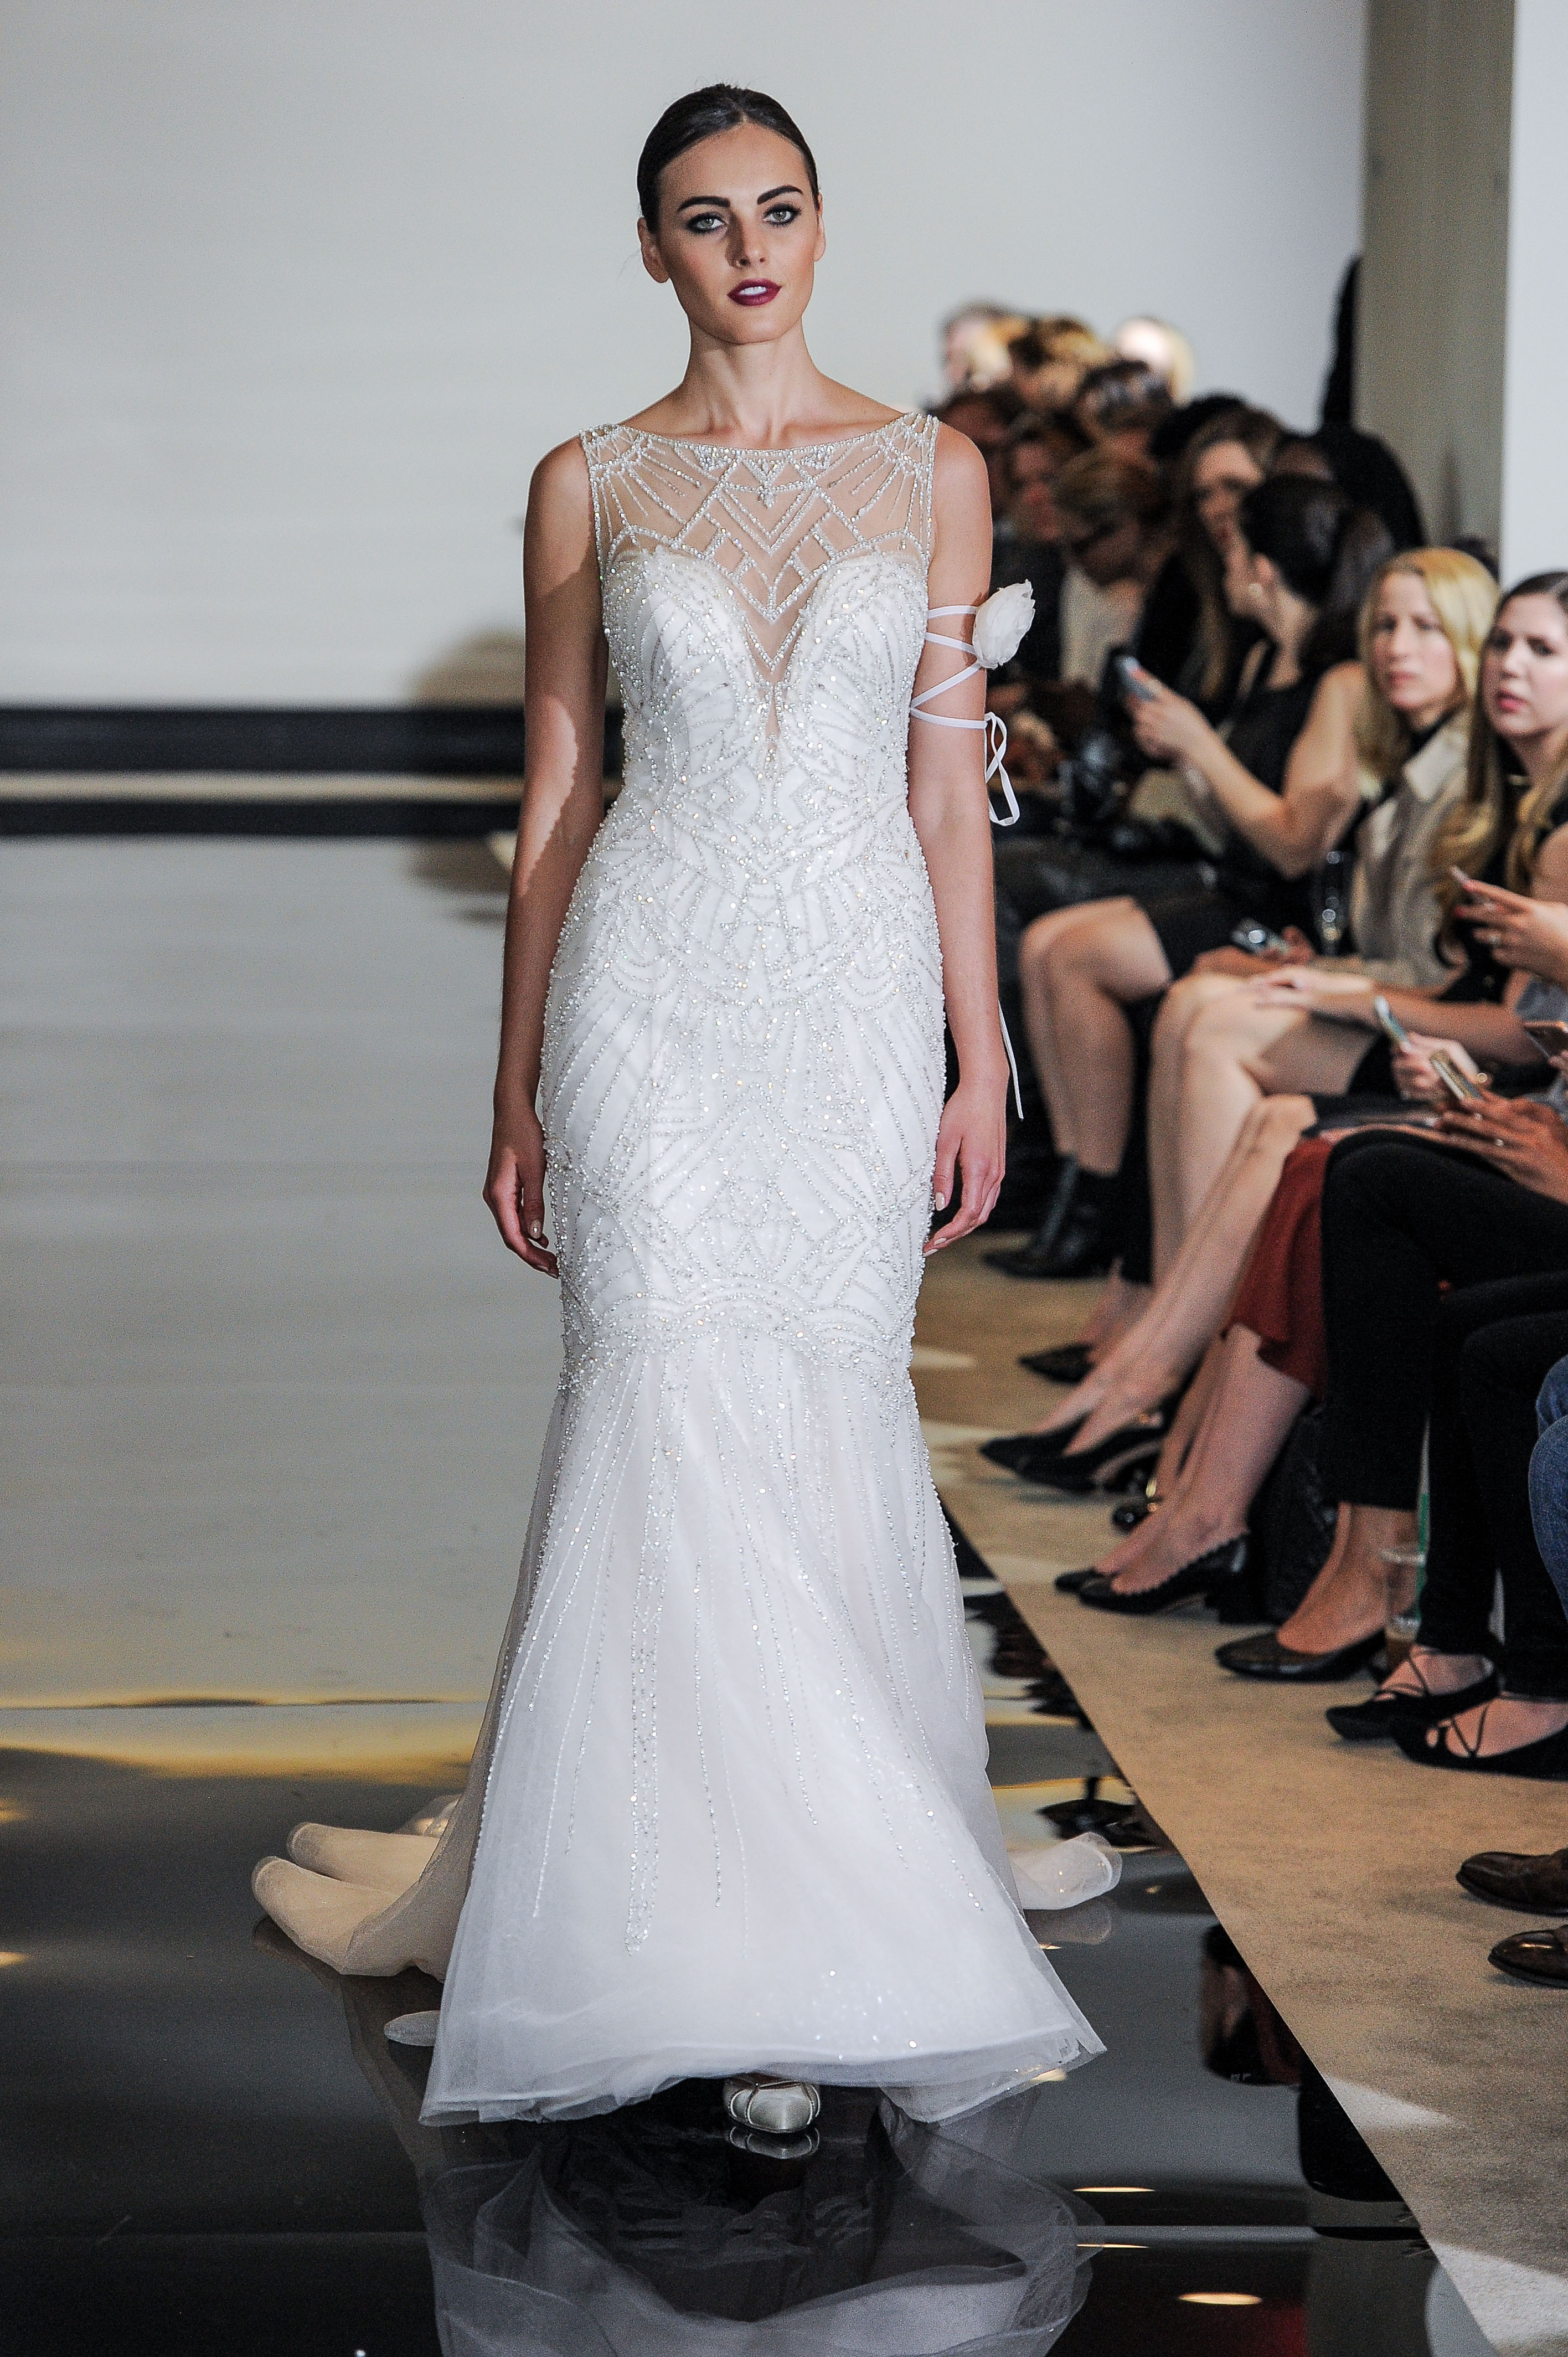 Justin Alexander Mermaid Wedding Dress with Illusion Neckline Spring 2018